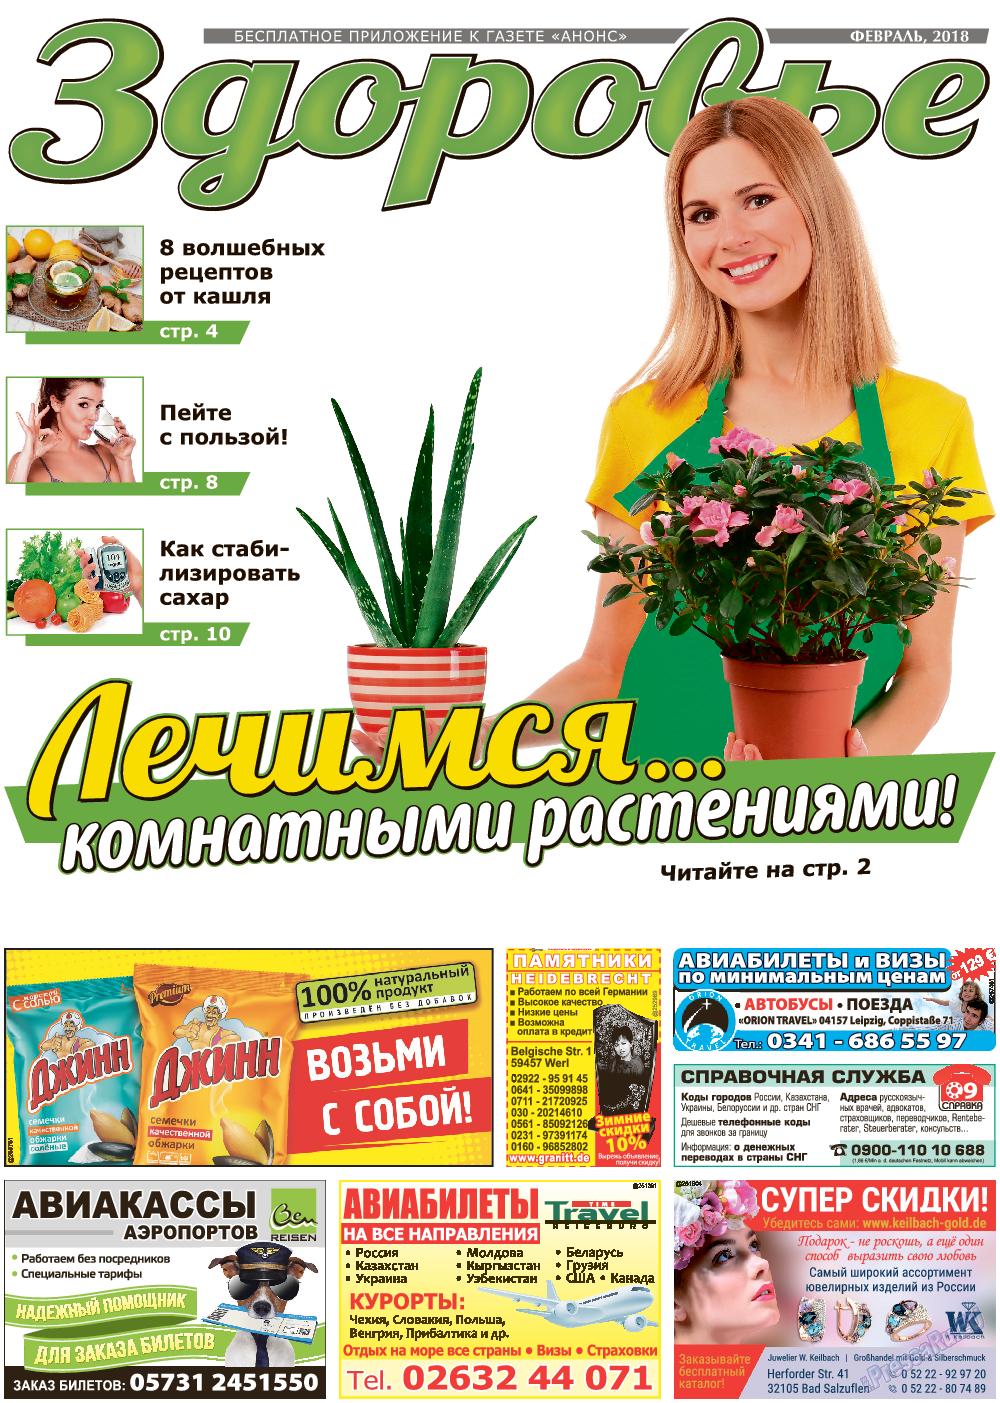 Здоровье (газета). 2018 год, номер 2, стр. 1